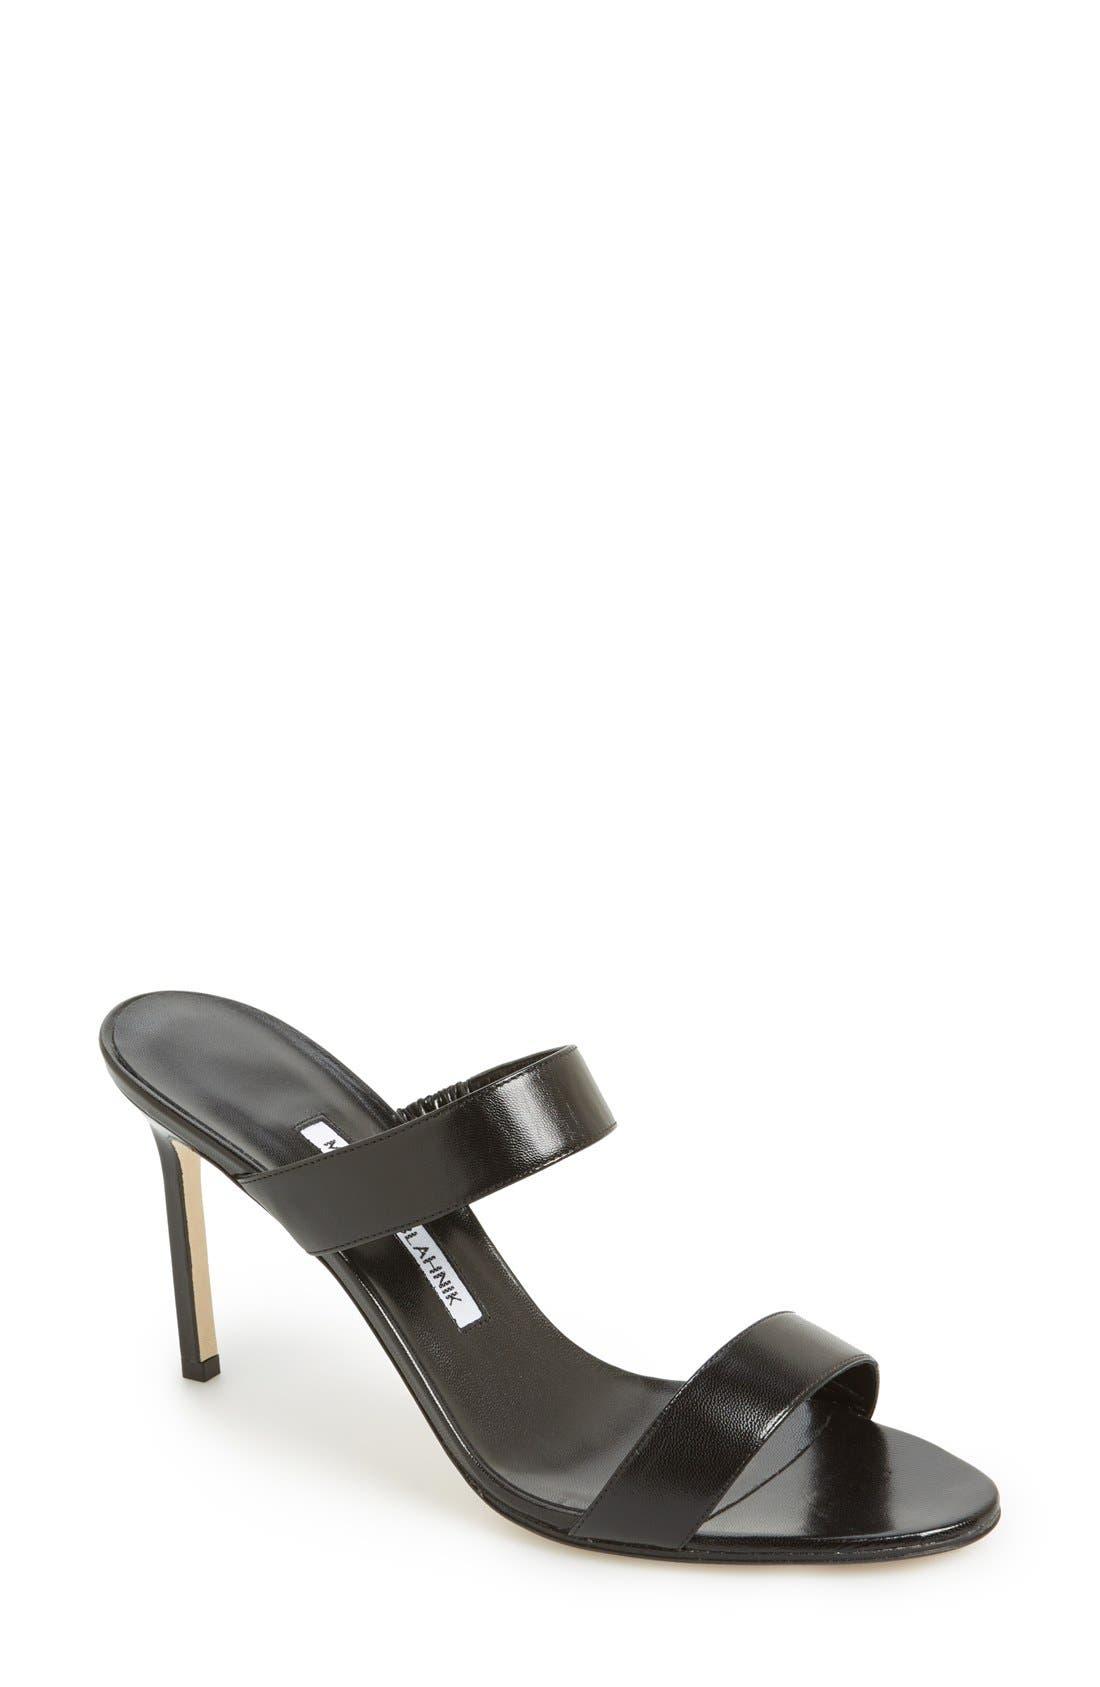 Main Image - Manolo Blahnik 'Muluca' Slide Sandal (Women)